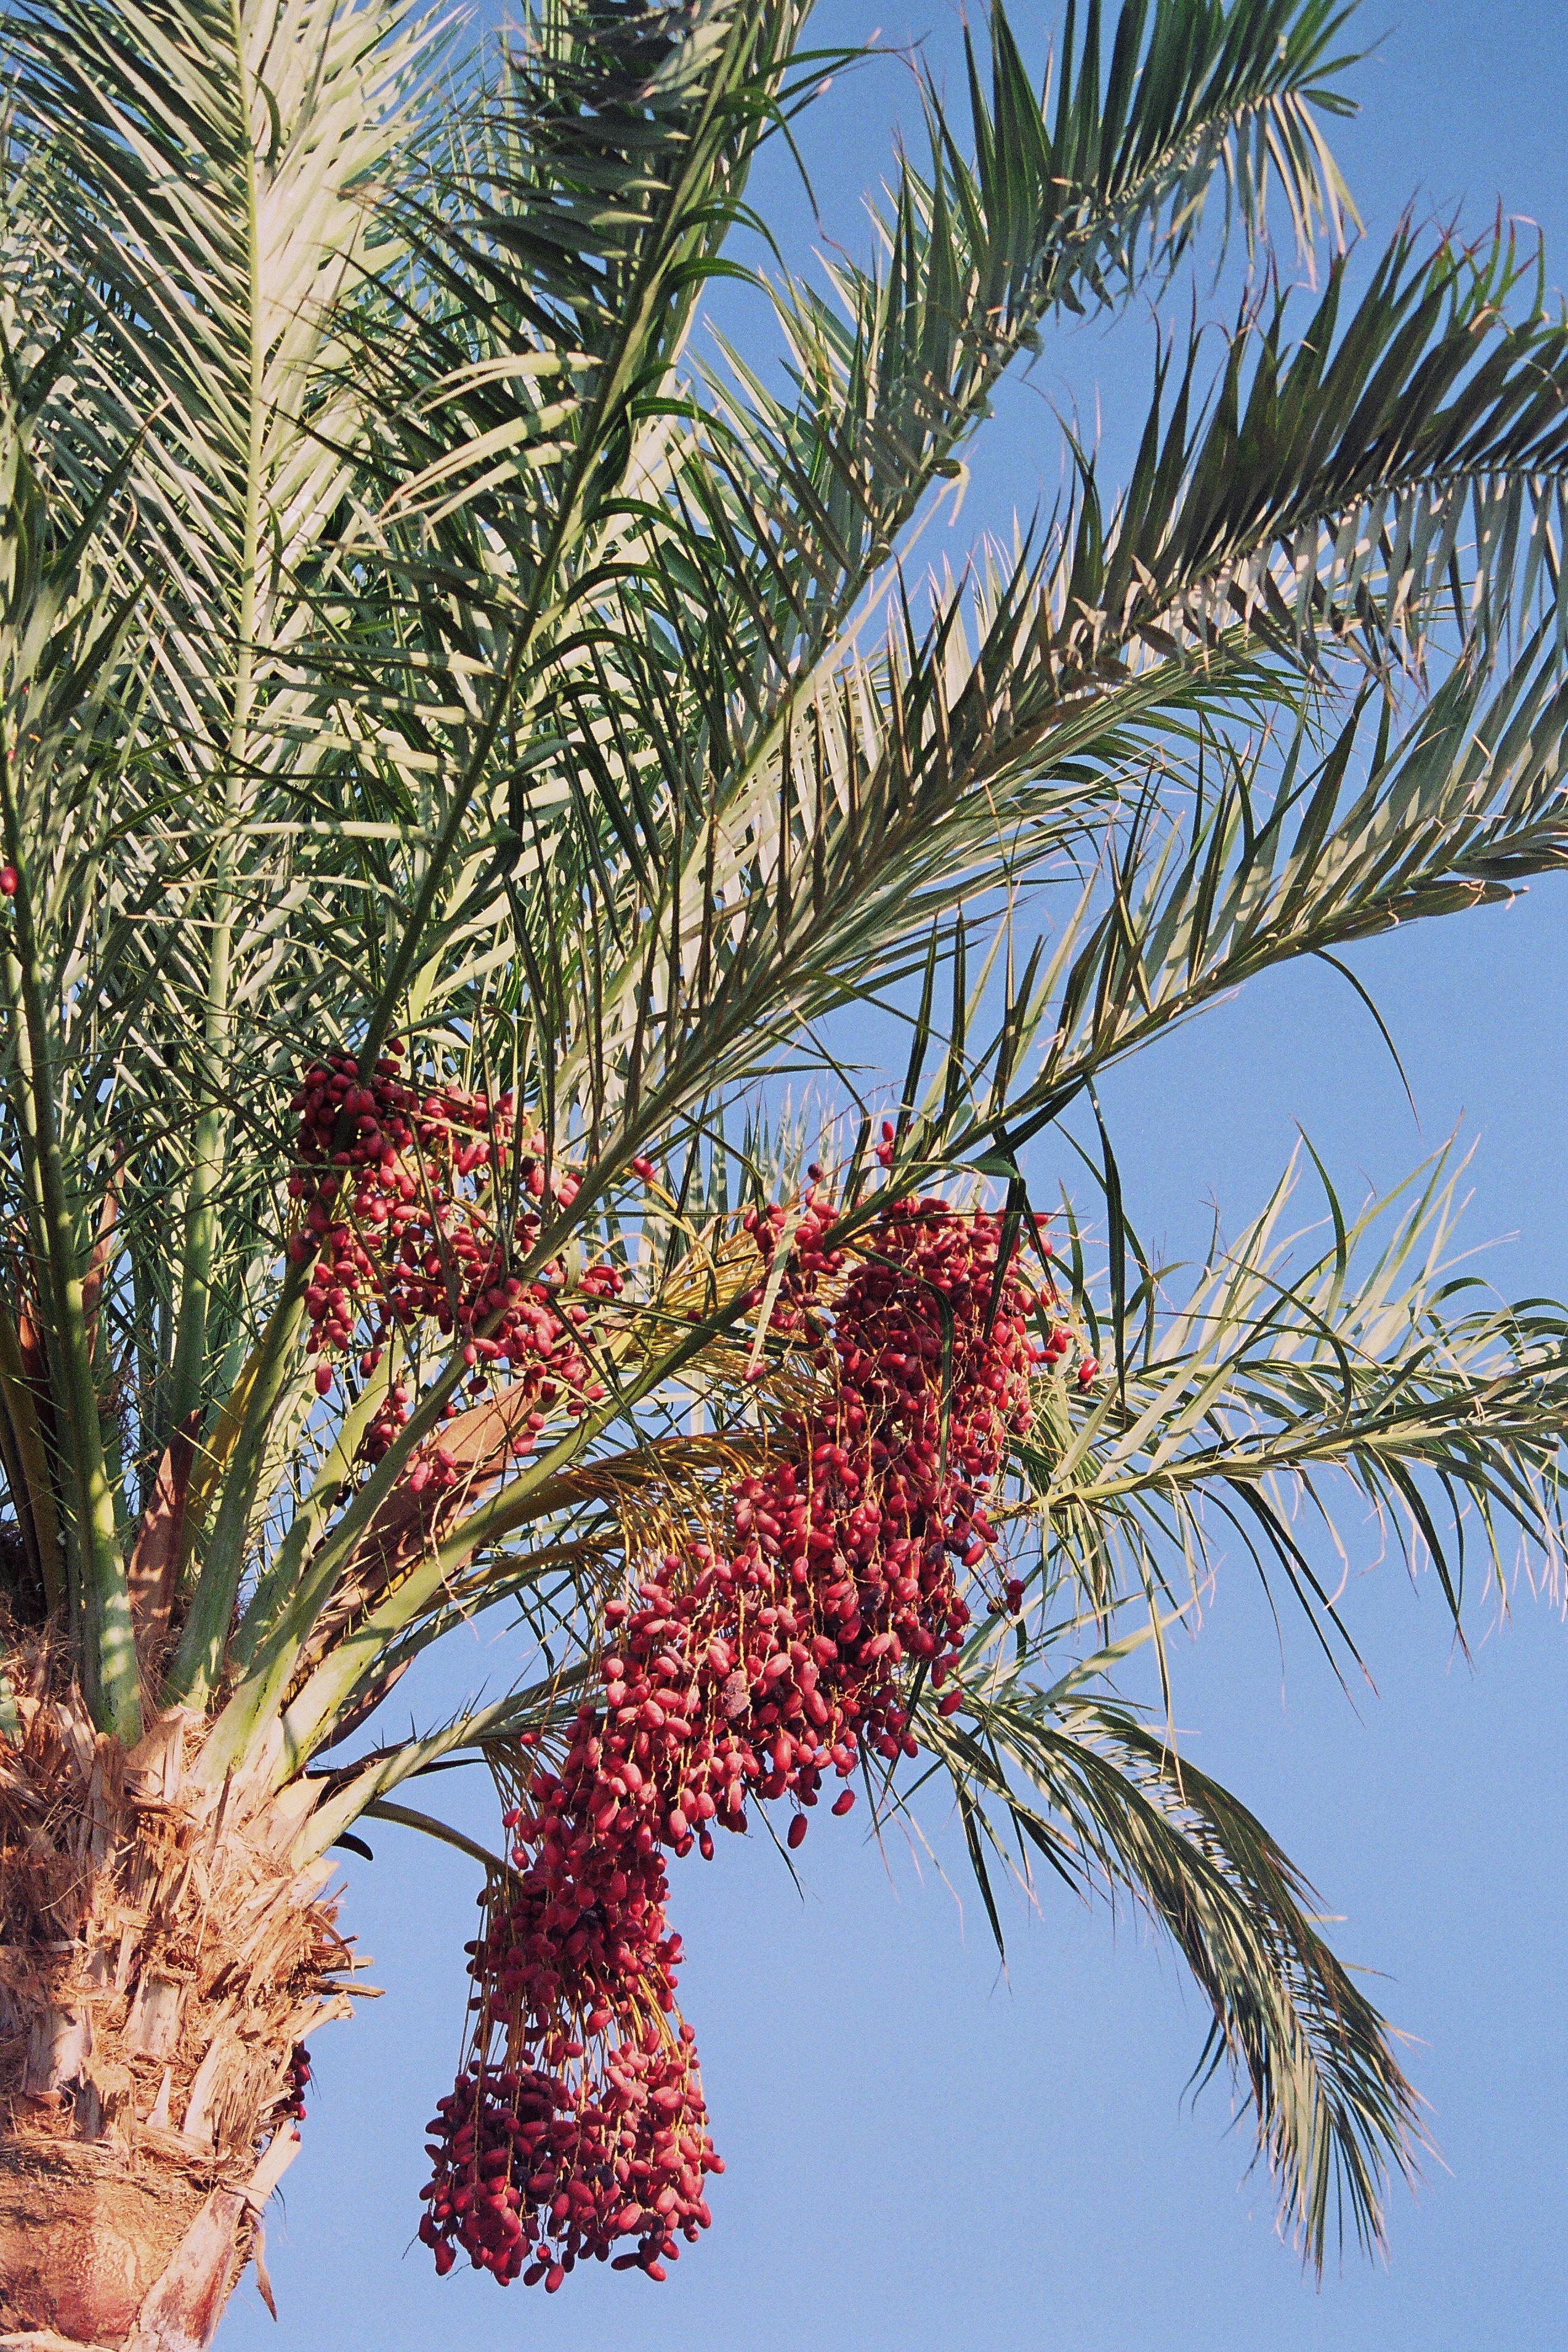 free images   tree  branch  fruit  leaf  flower  food  produce  evergreen  botany  flora  shrub